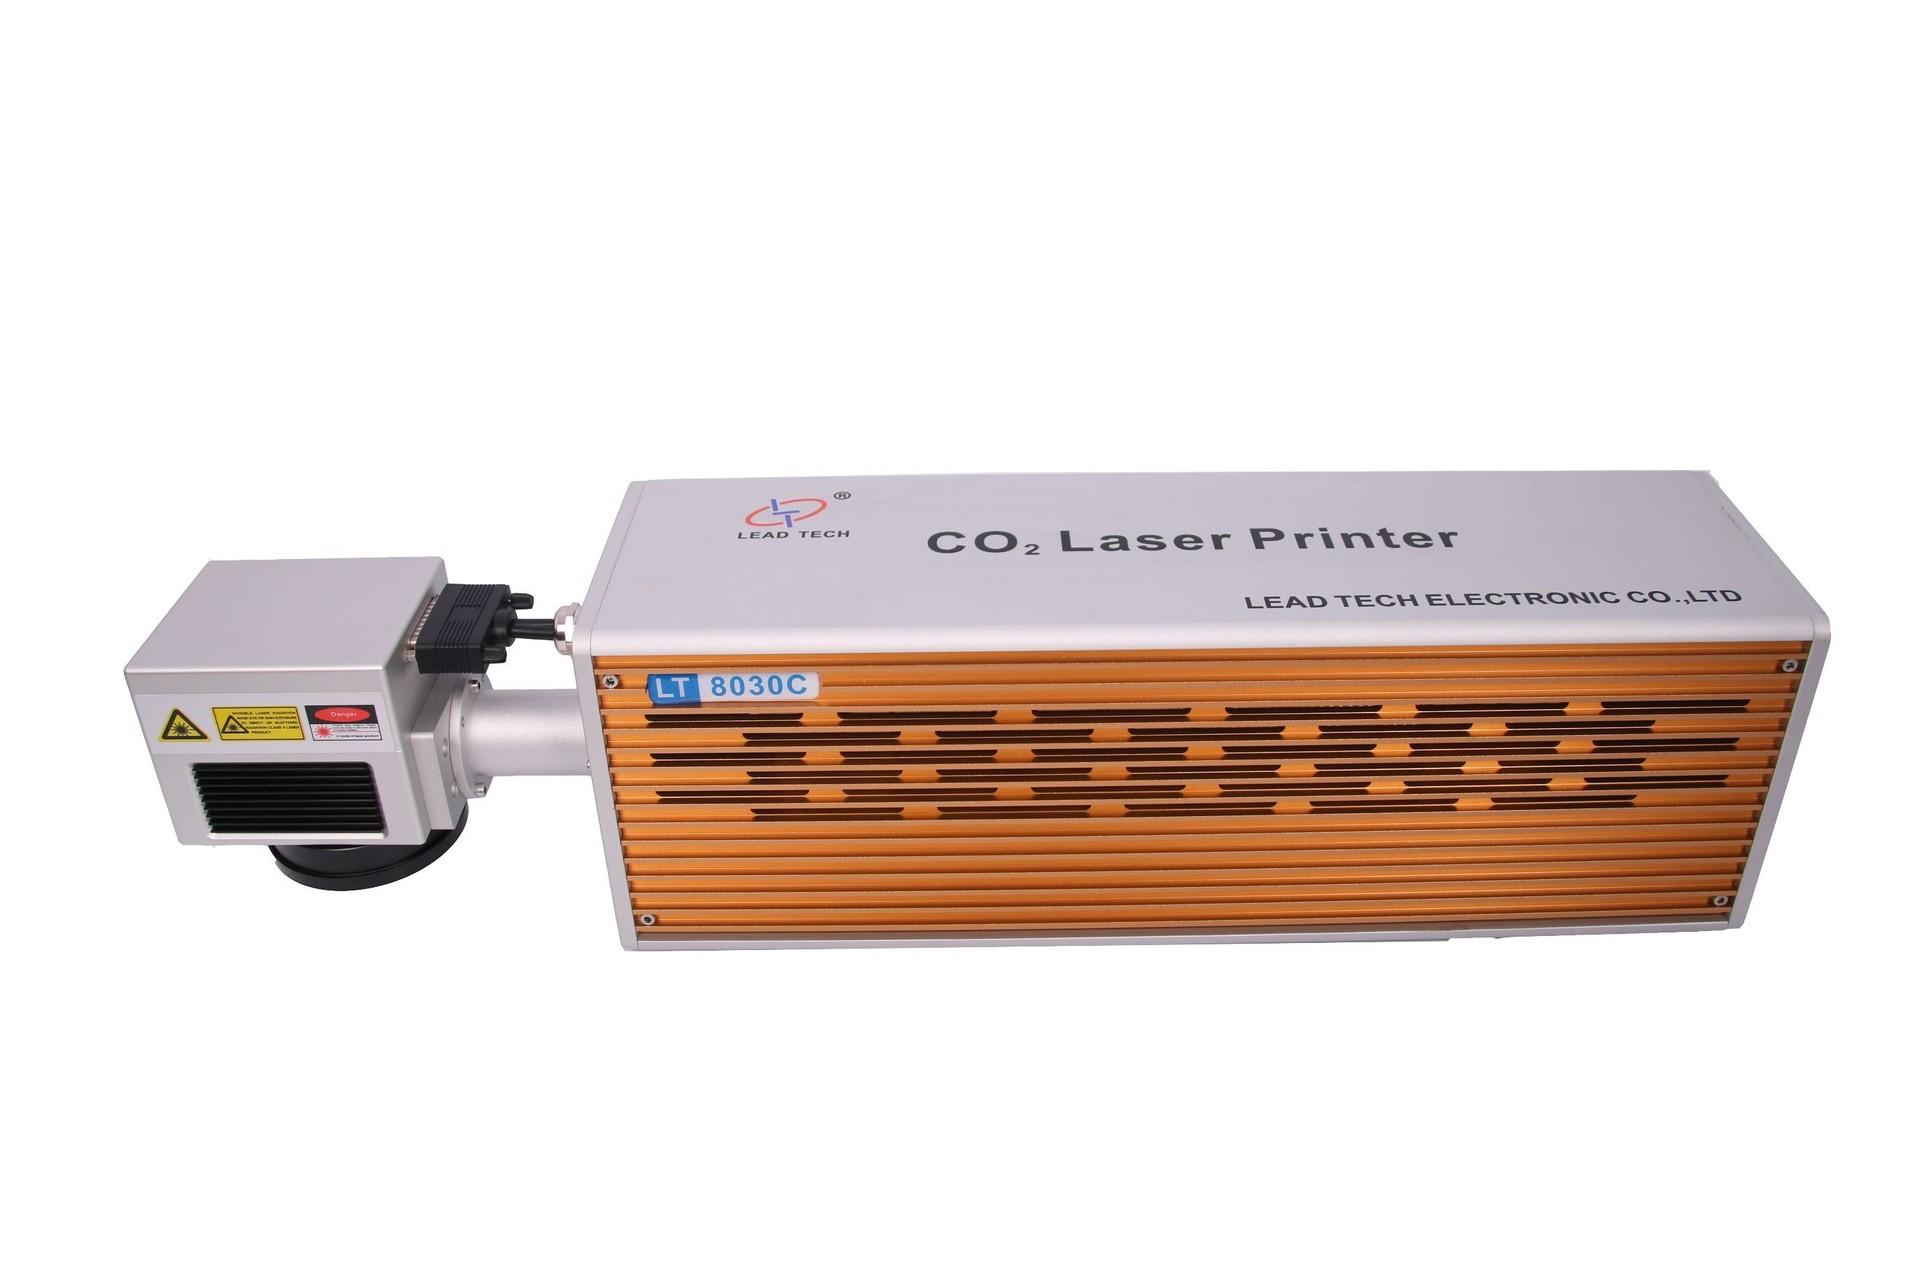 Lt8020c/Lt8030c CO2 20W/30W High Performance Digital Laser Marking Printer for PPR/PE/PVC Pipe Marking